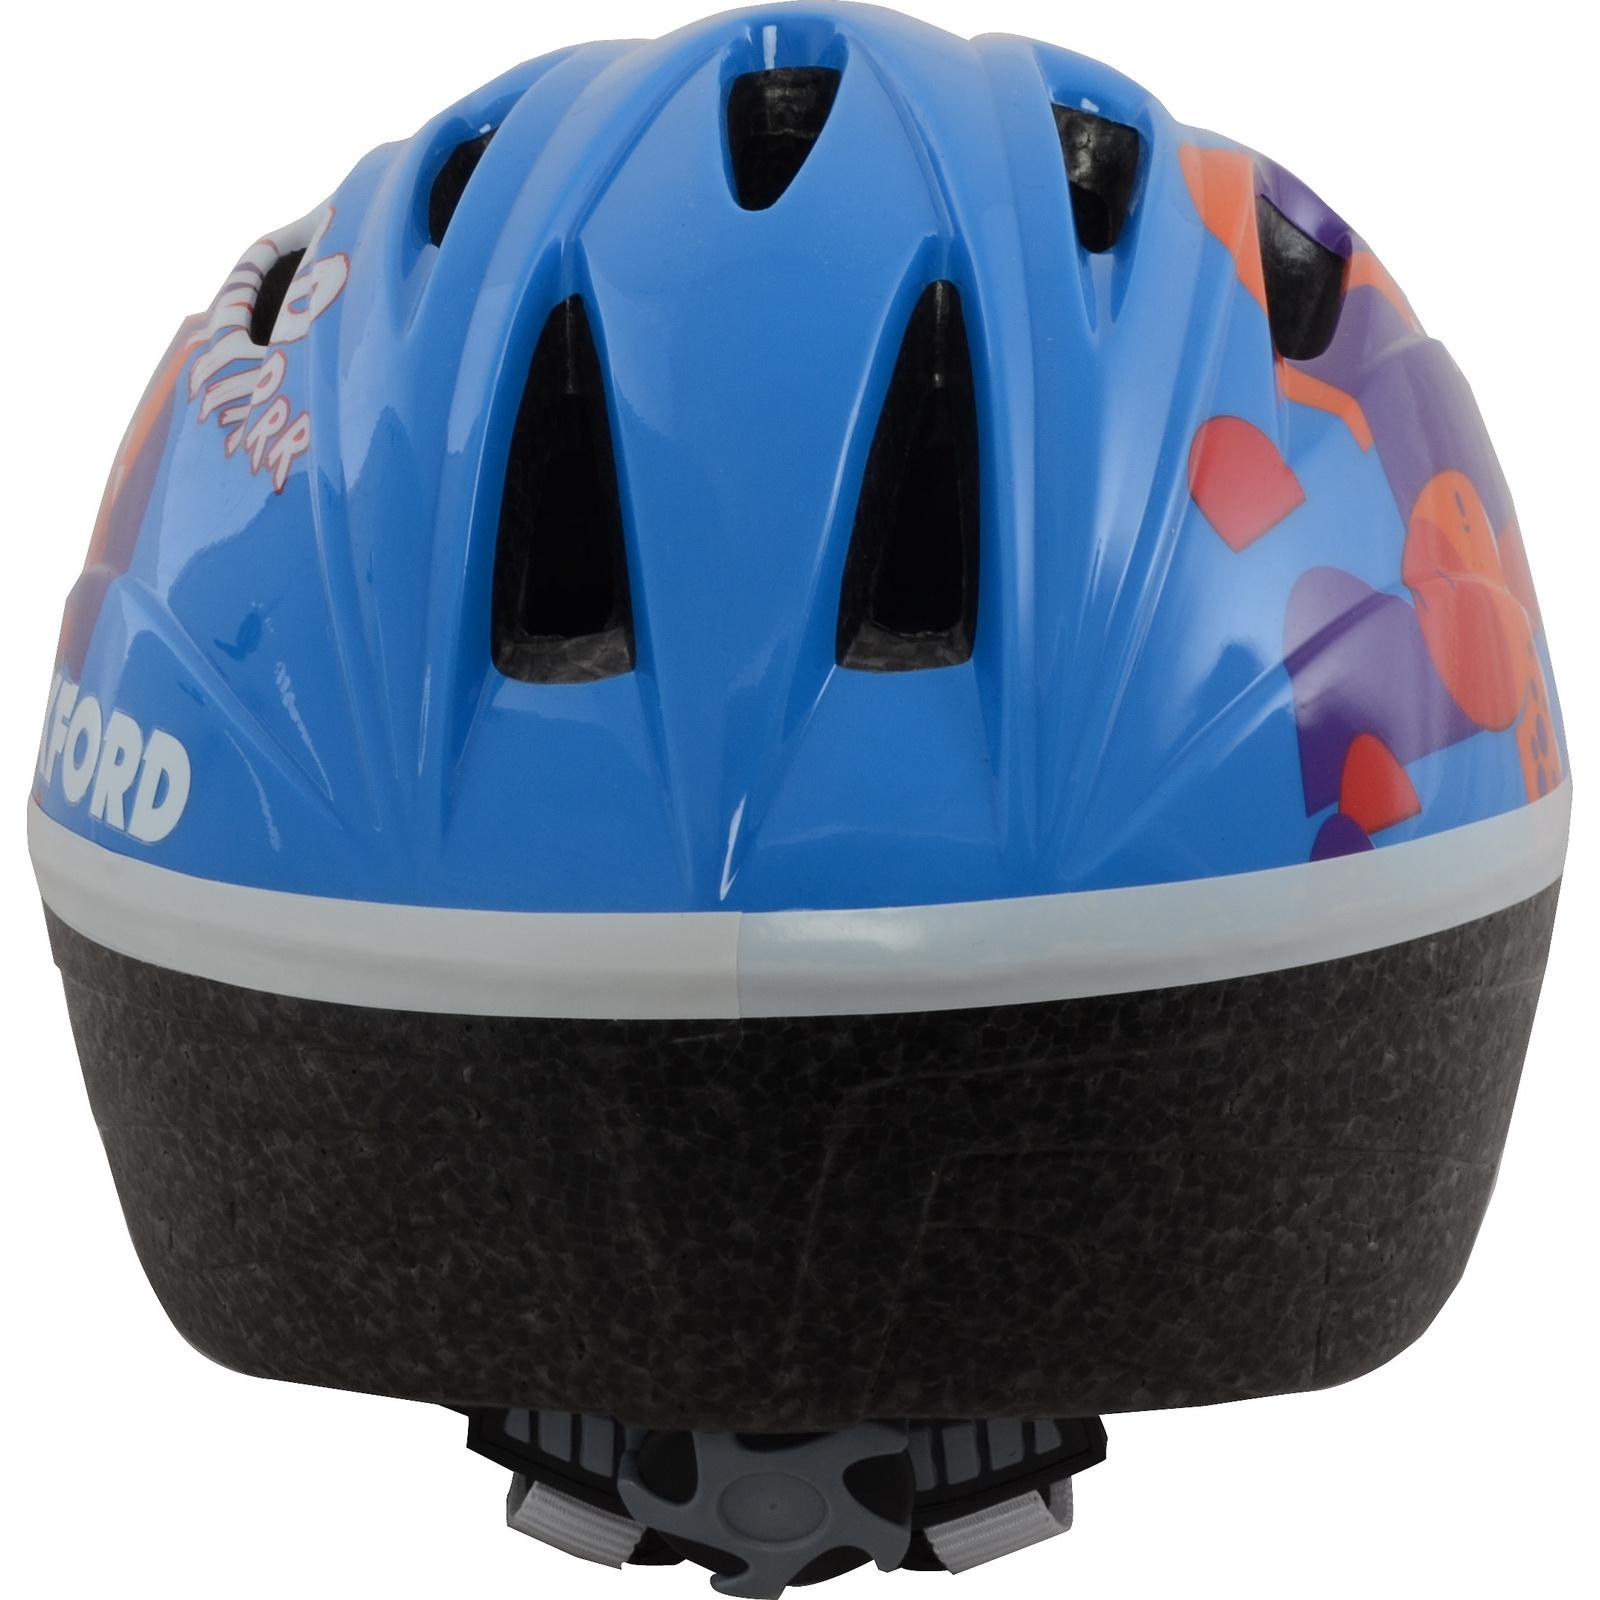 Oxford Grrr Blue Junior Cycle Helmet Kids Childrens Bike